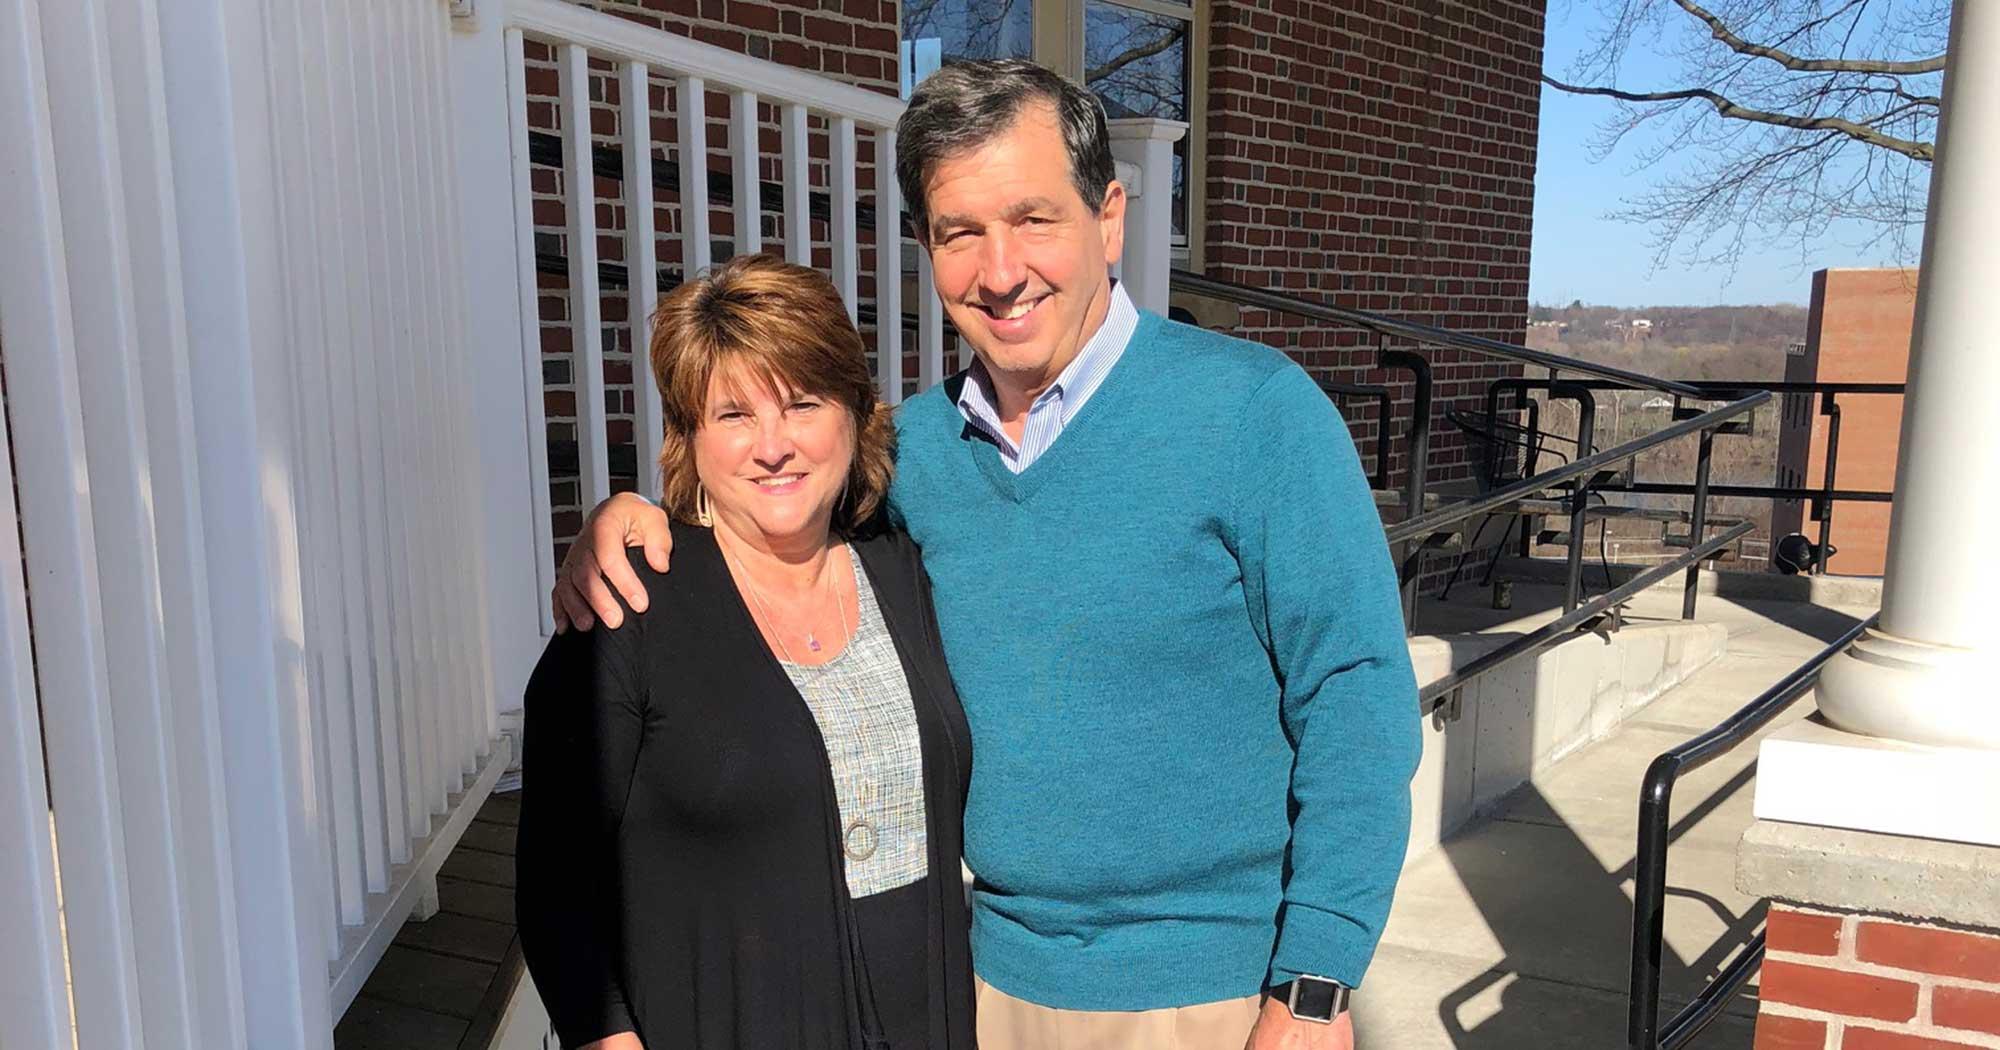 Meet Jeannie and Mike Filomeno